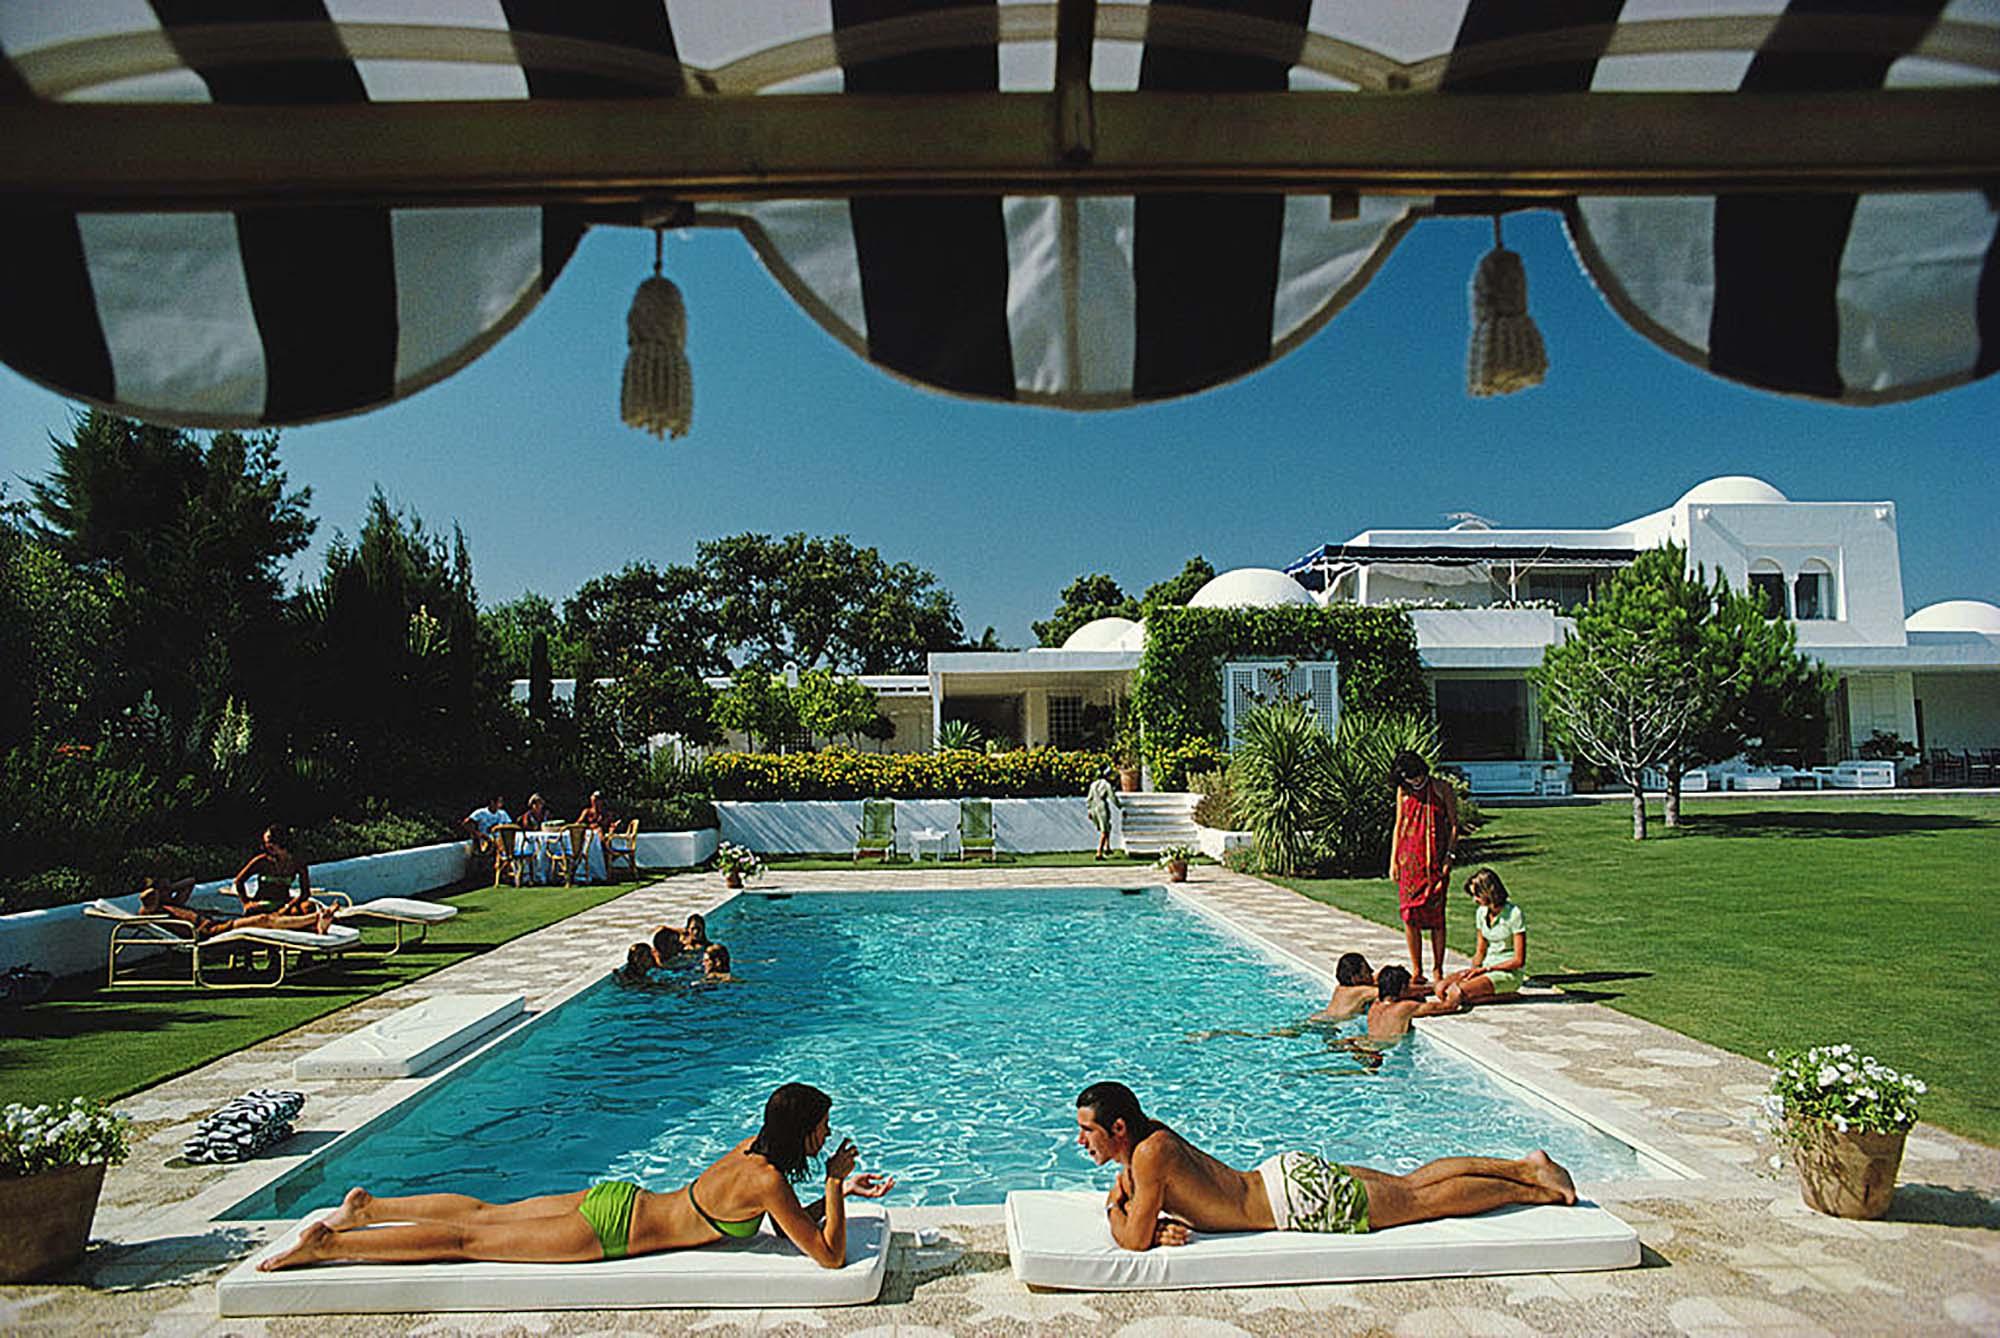 Poolside In Sotogrande fine art photography